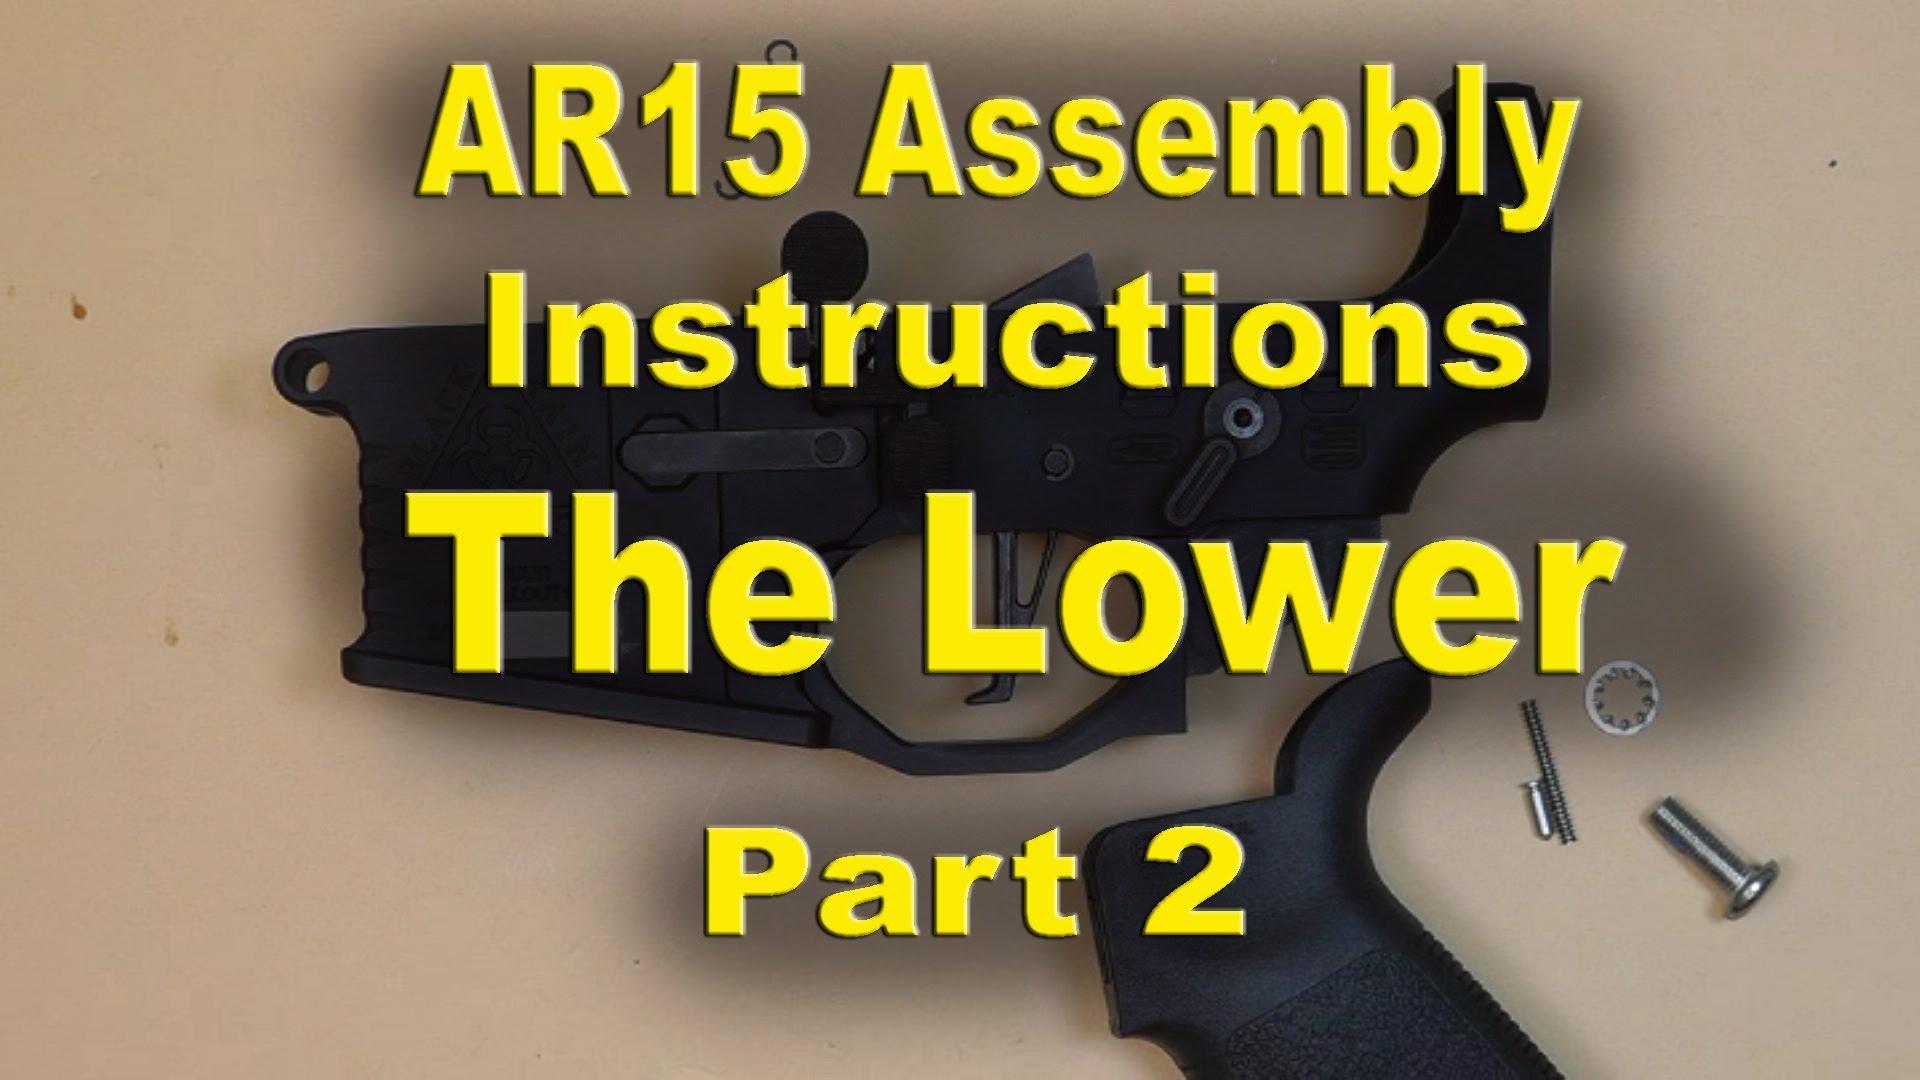 Black Rain Ordnance AR15 Assembly Instructions PART 2 (The Lower)